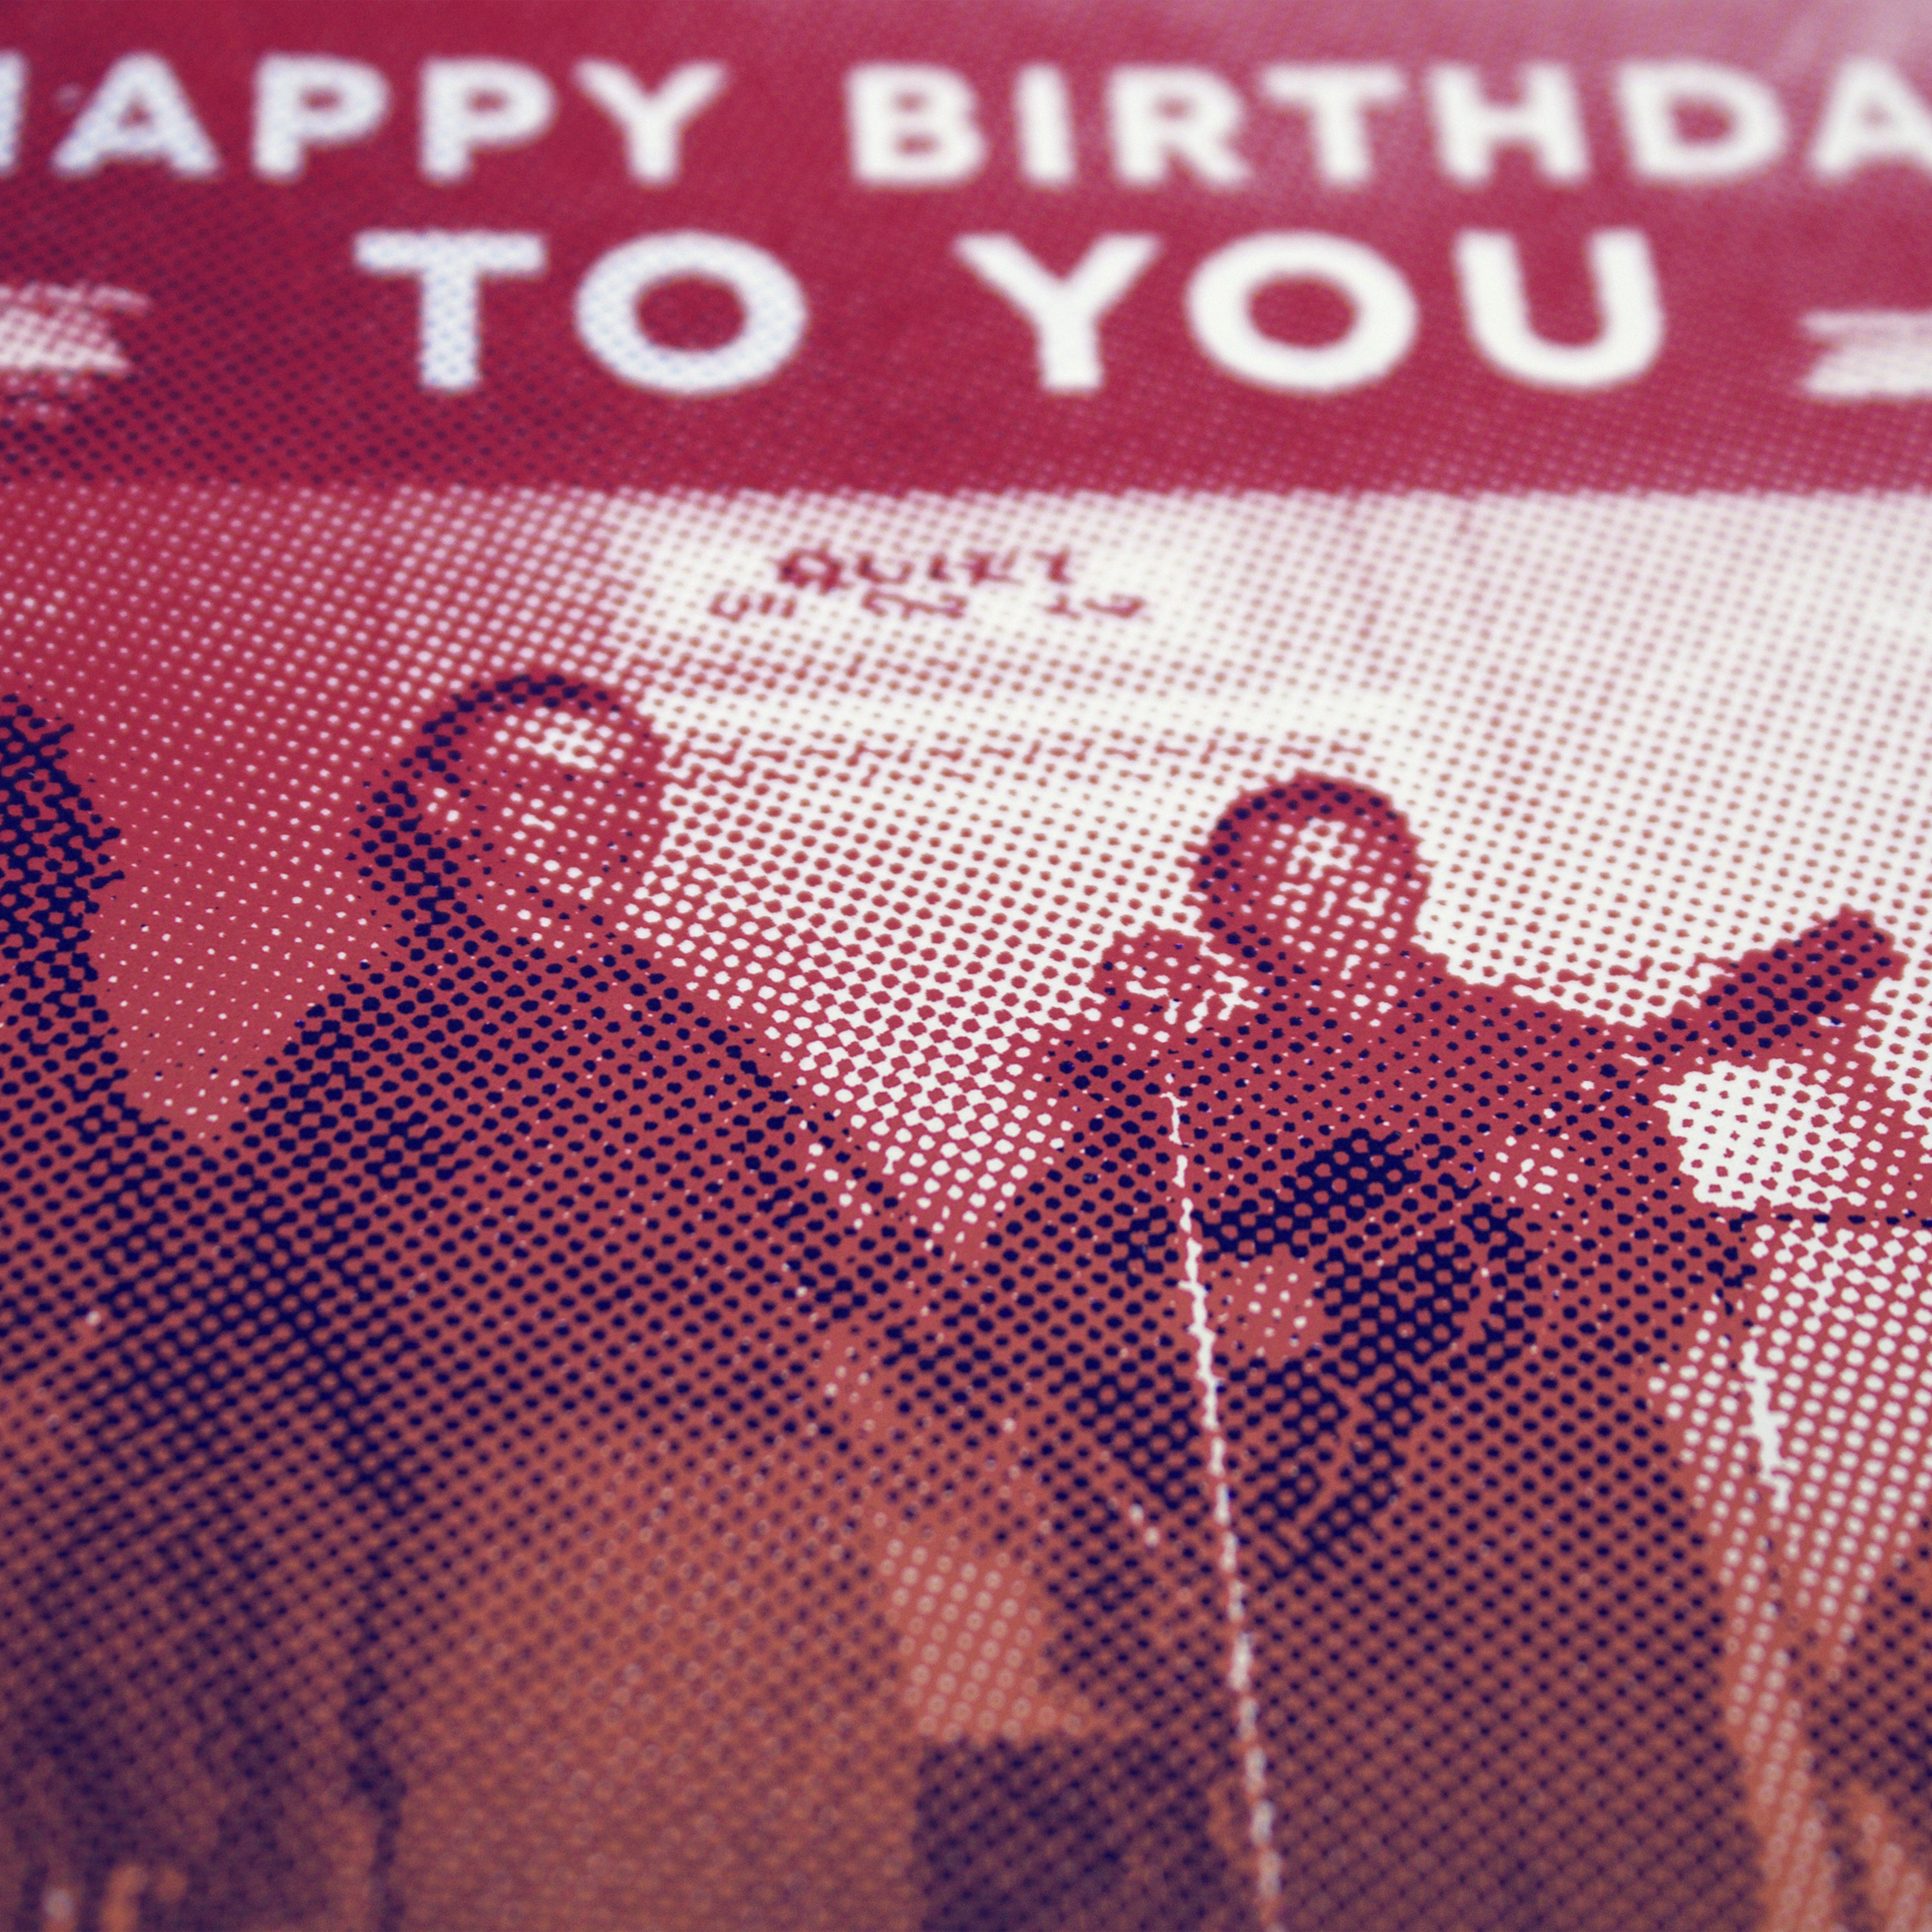 Rock Birthday Cards Free Birthday Cards